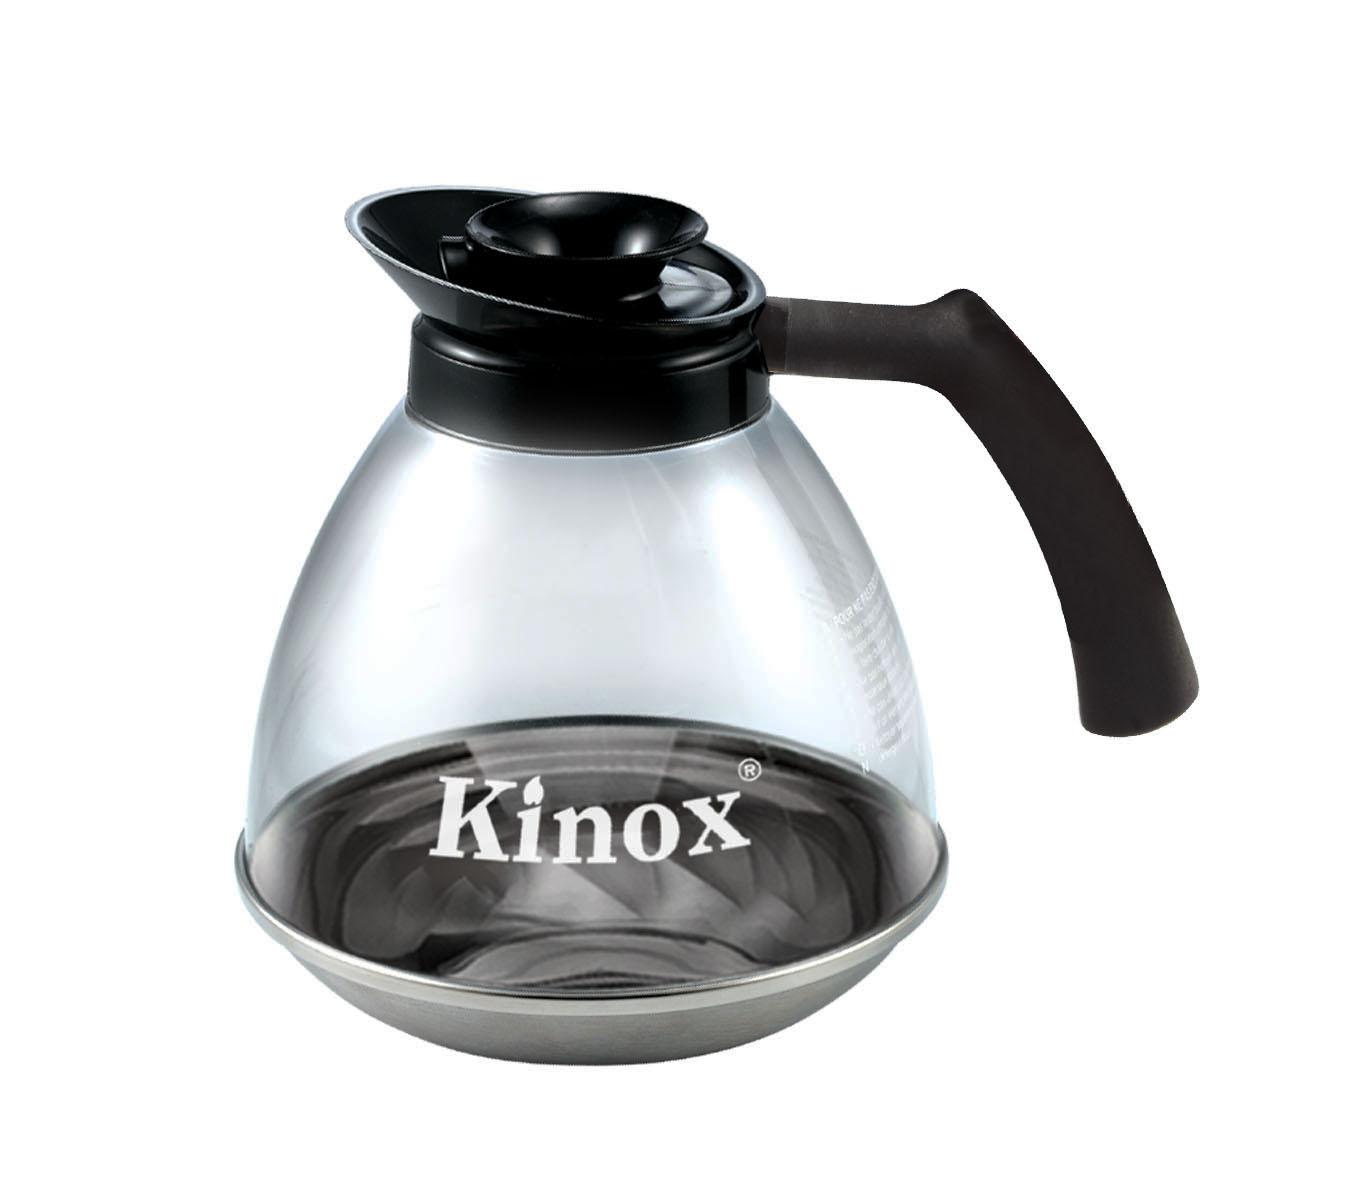 Kinpx